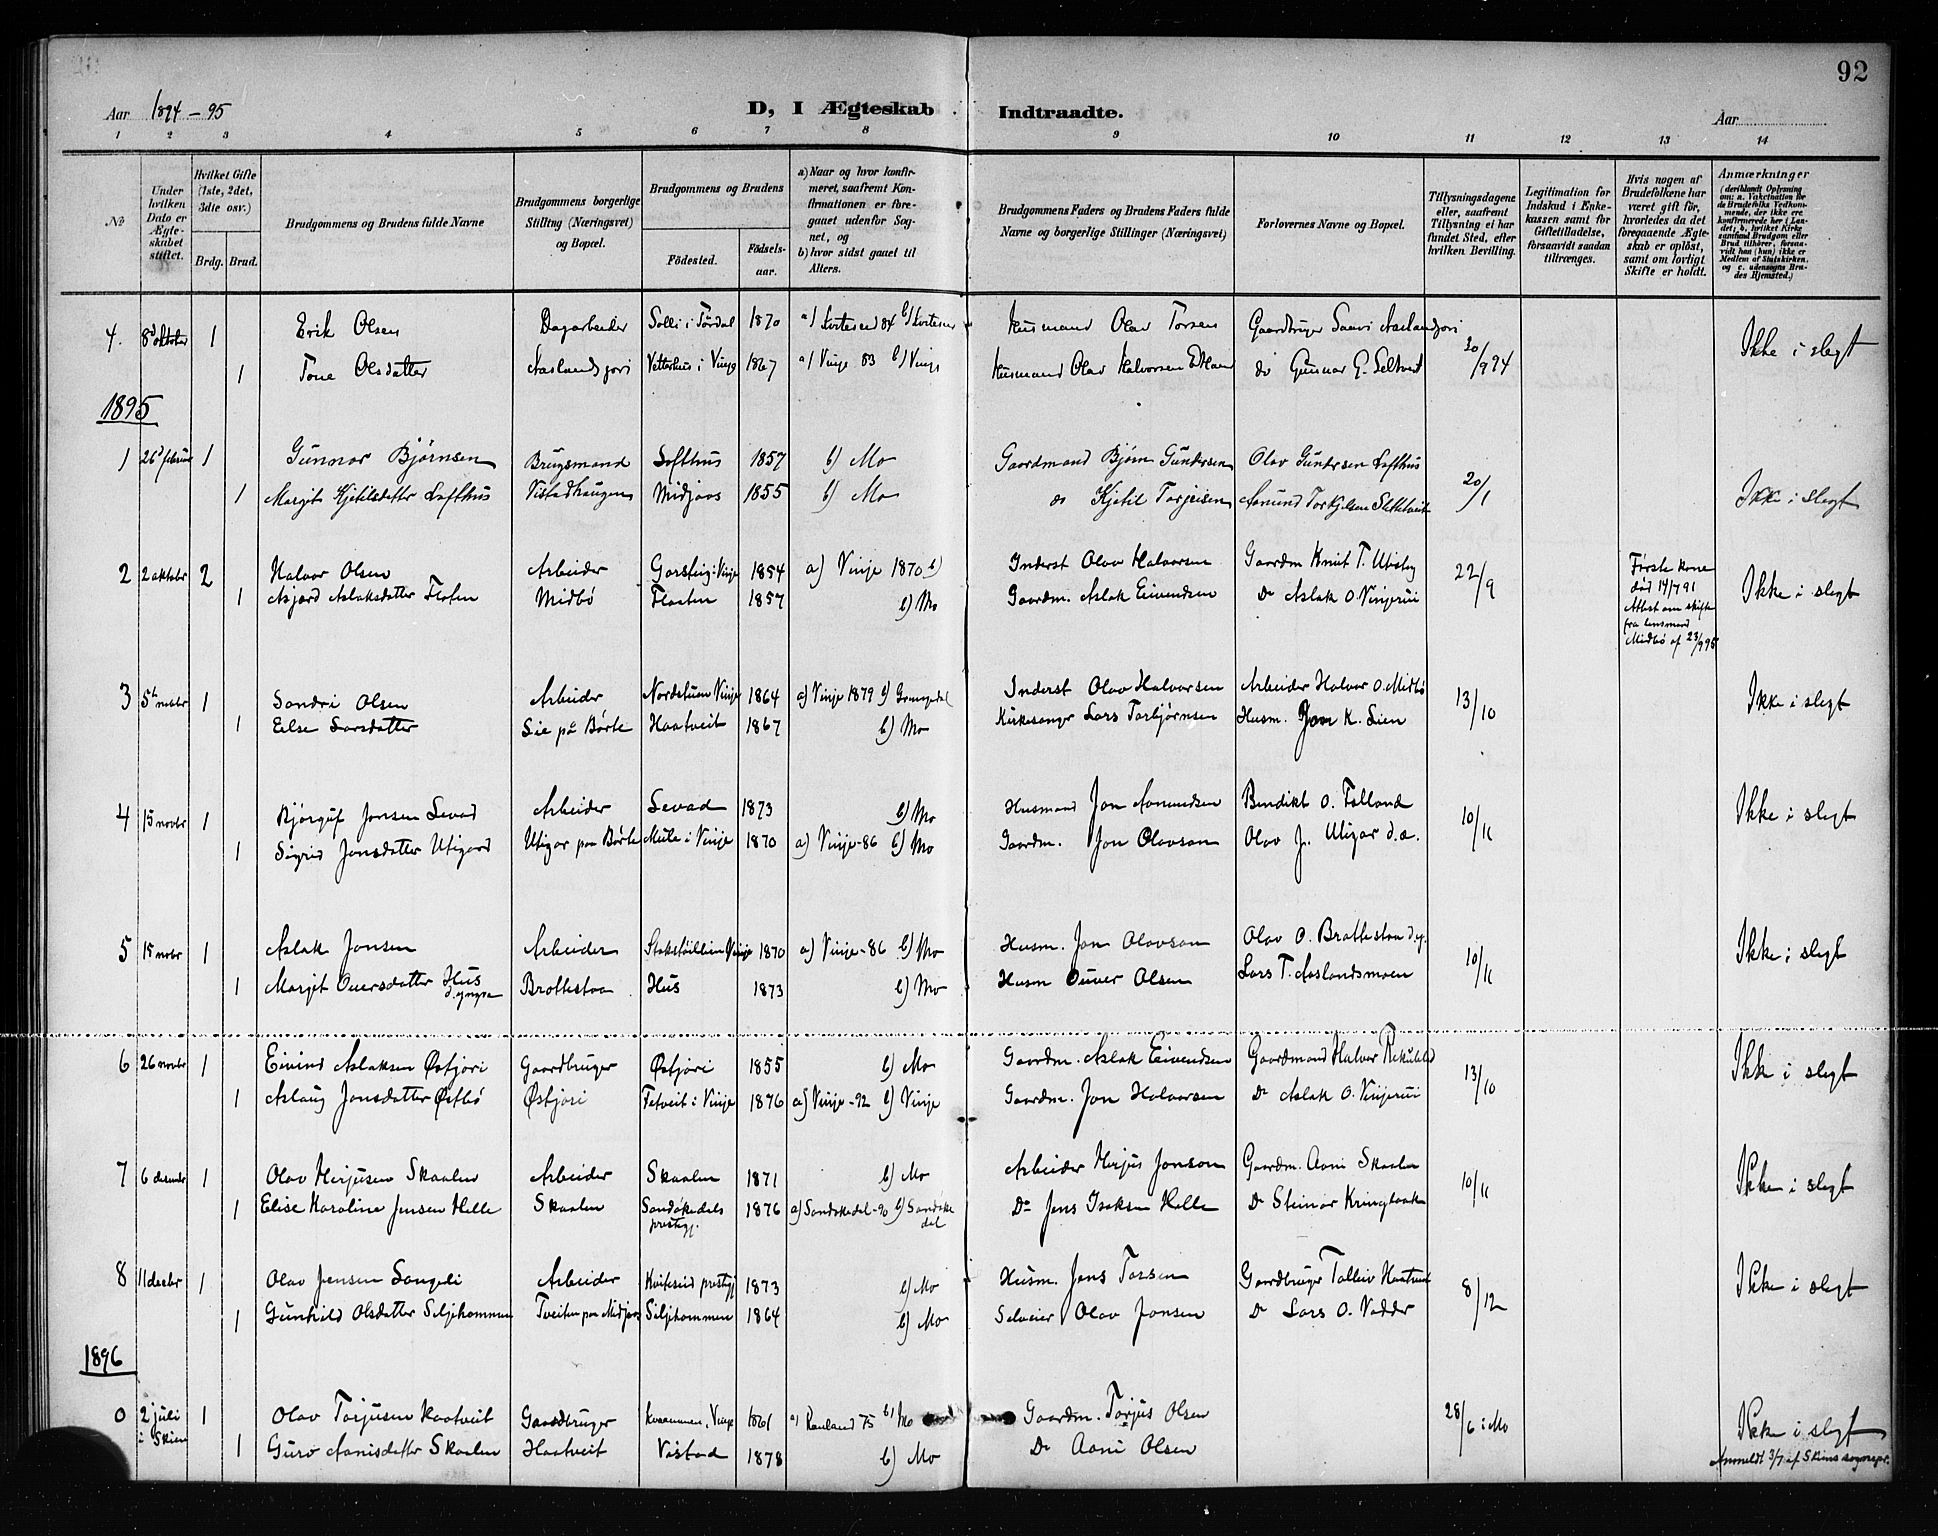 SAKO, Mo kirkebøker, G/Ga/L0002: Klokkerbok nr. I 2, 1892-1914, s. 92